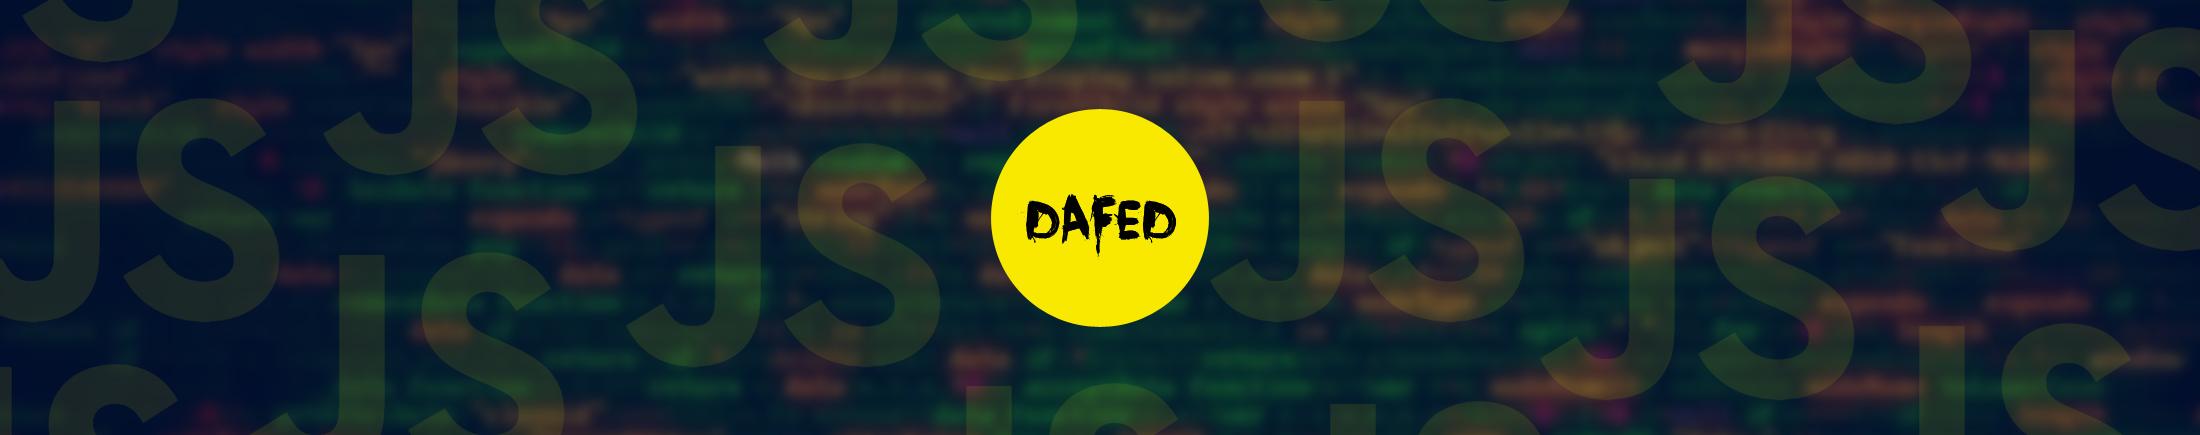 DaFED-JS-kurs-2200x435